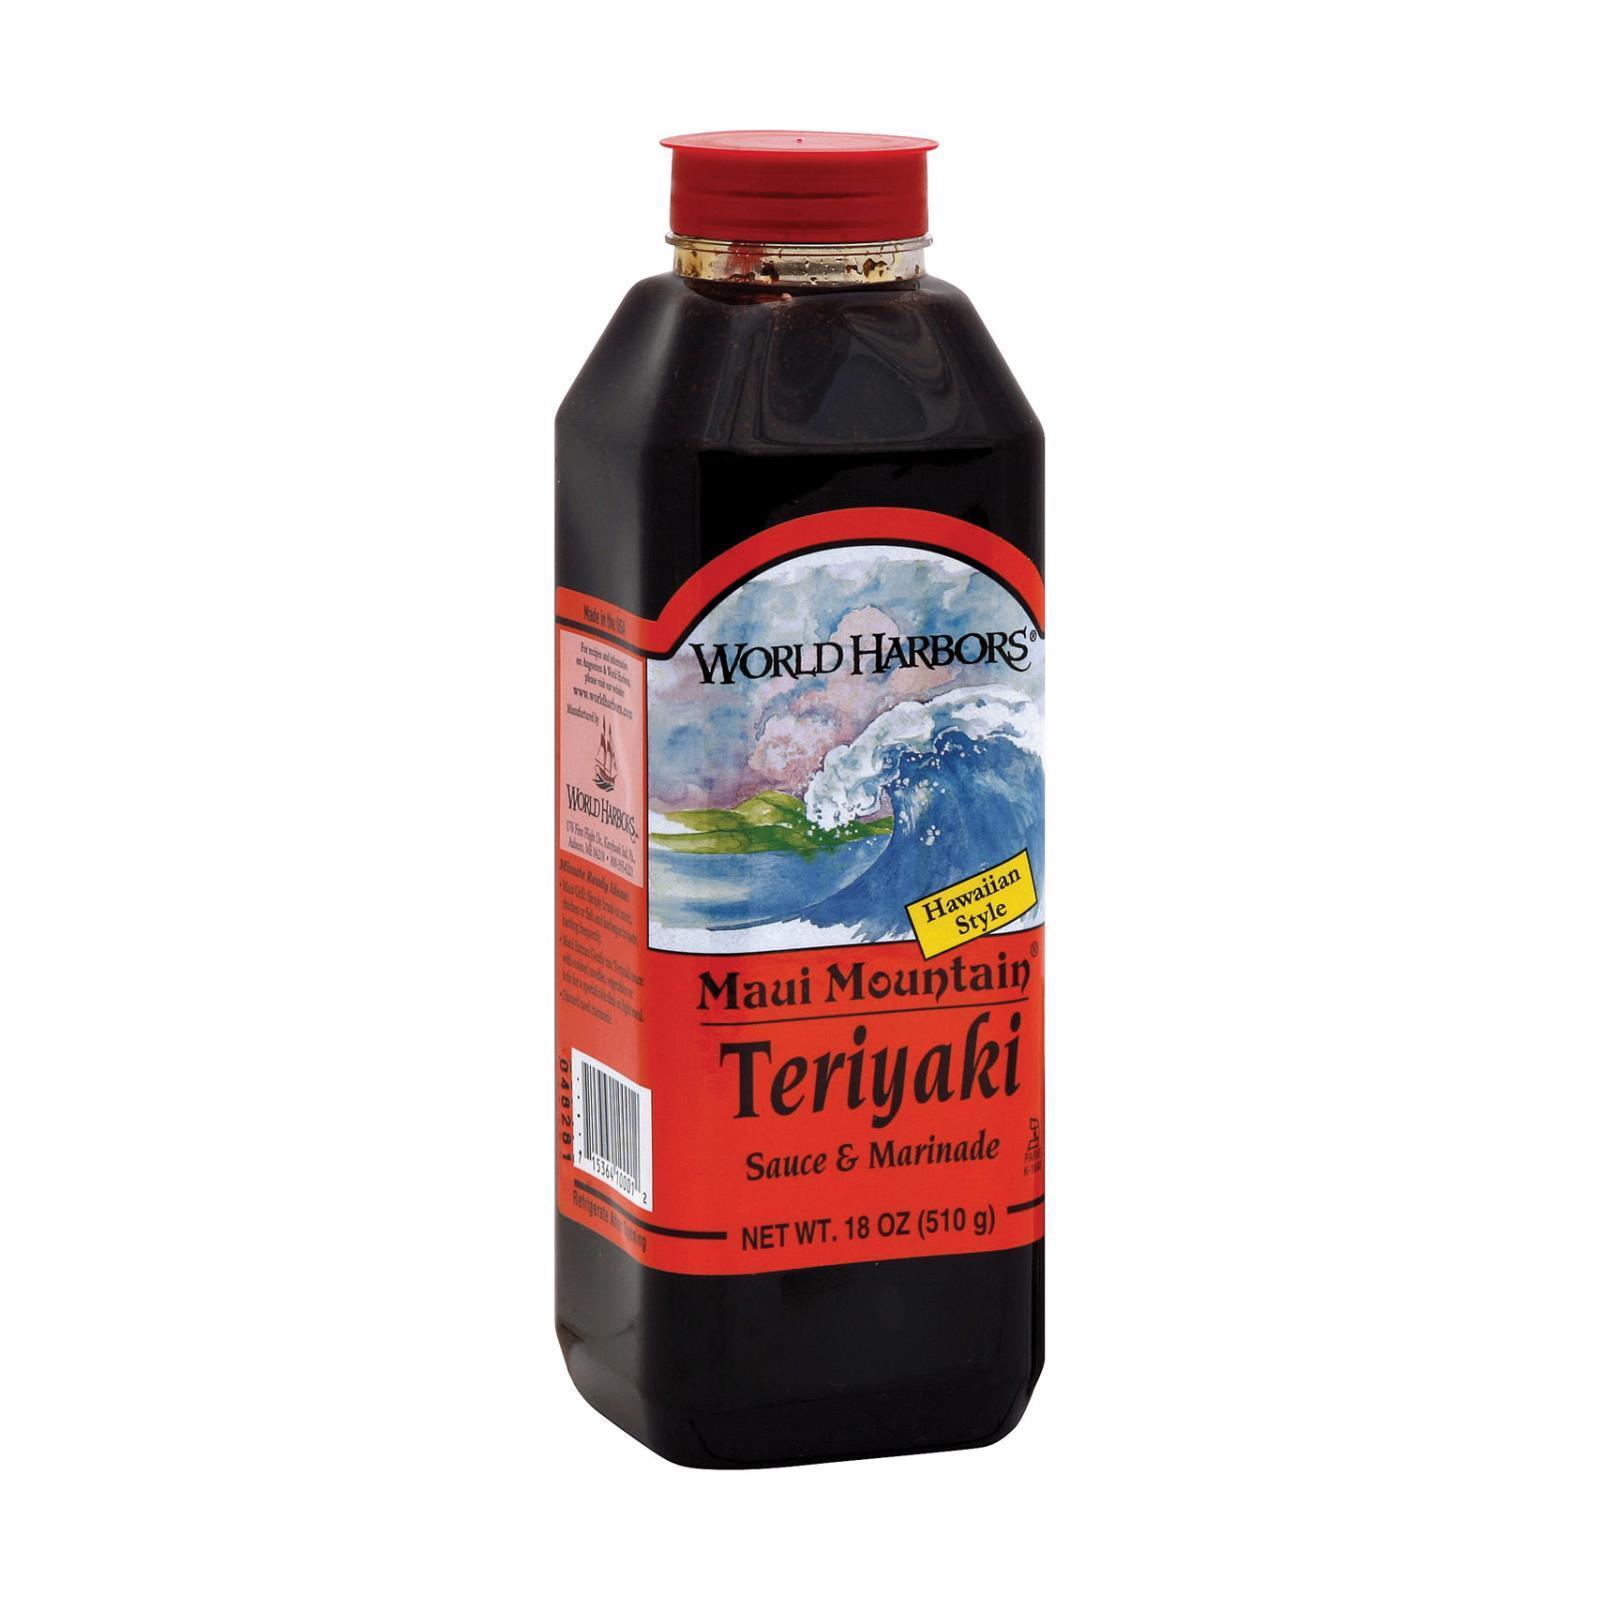 World Harbor Maui Mountain Teriyaki Marinade and Sauce - Case of 6 - 16 Fl oz.